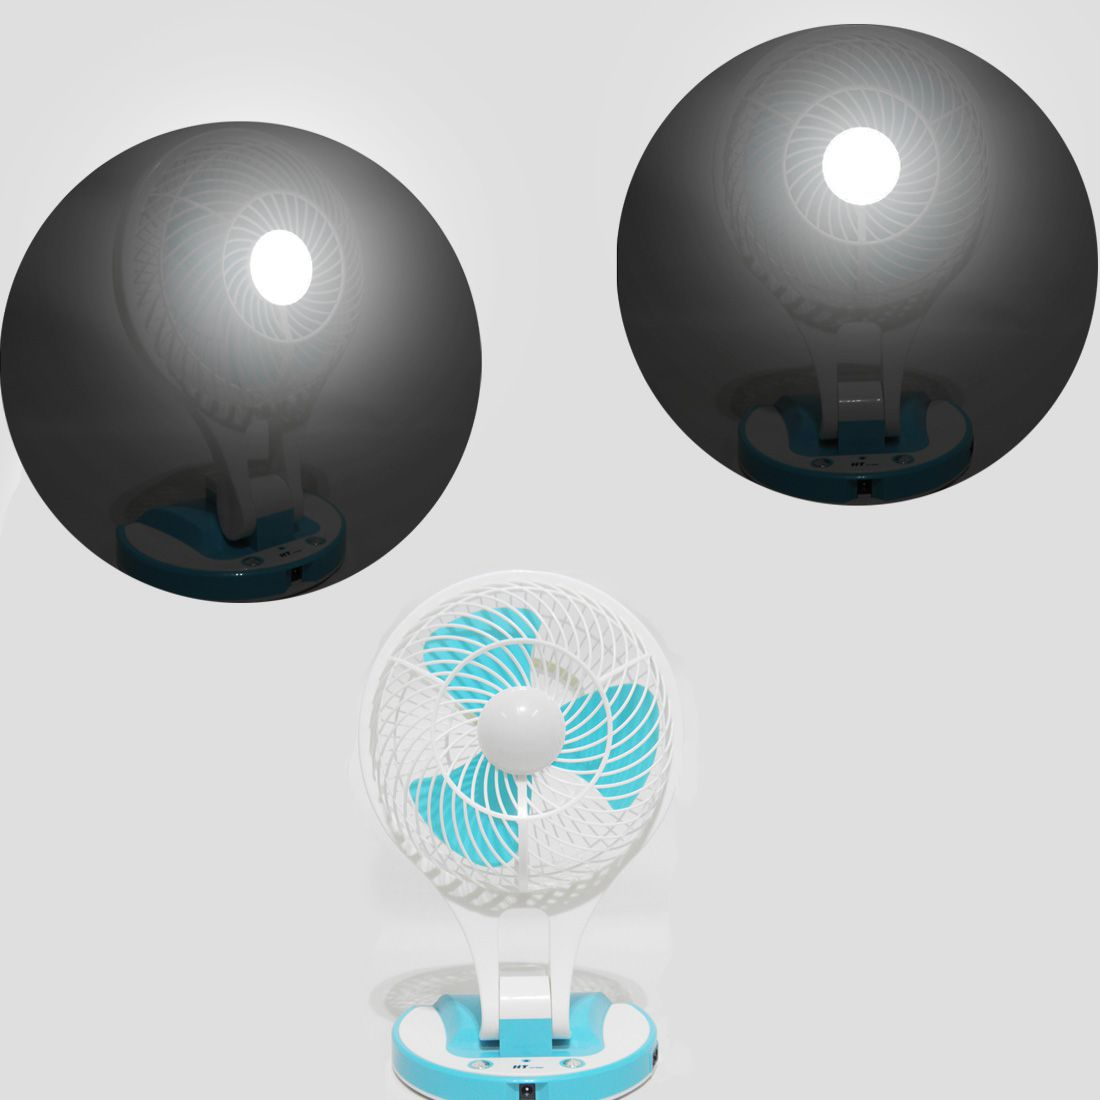 Ventilador Bateria Recarregavel Luz Com 21 Led Ajustavel Azul Portatil